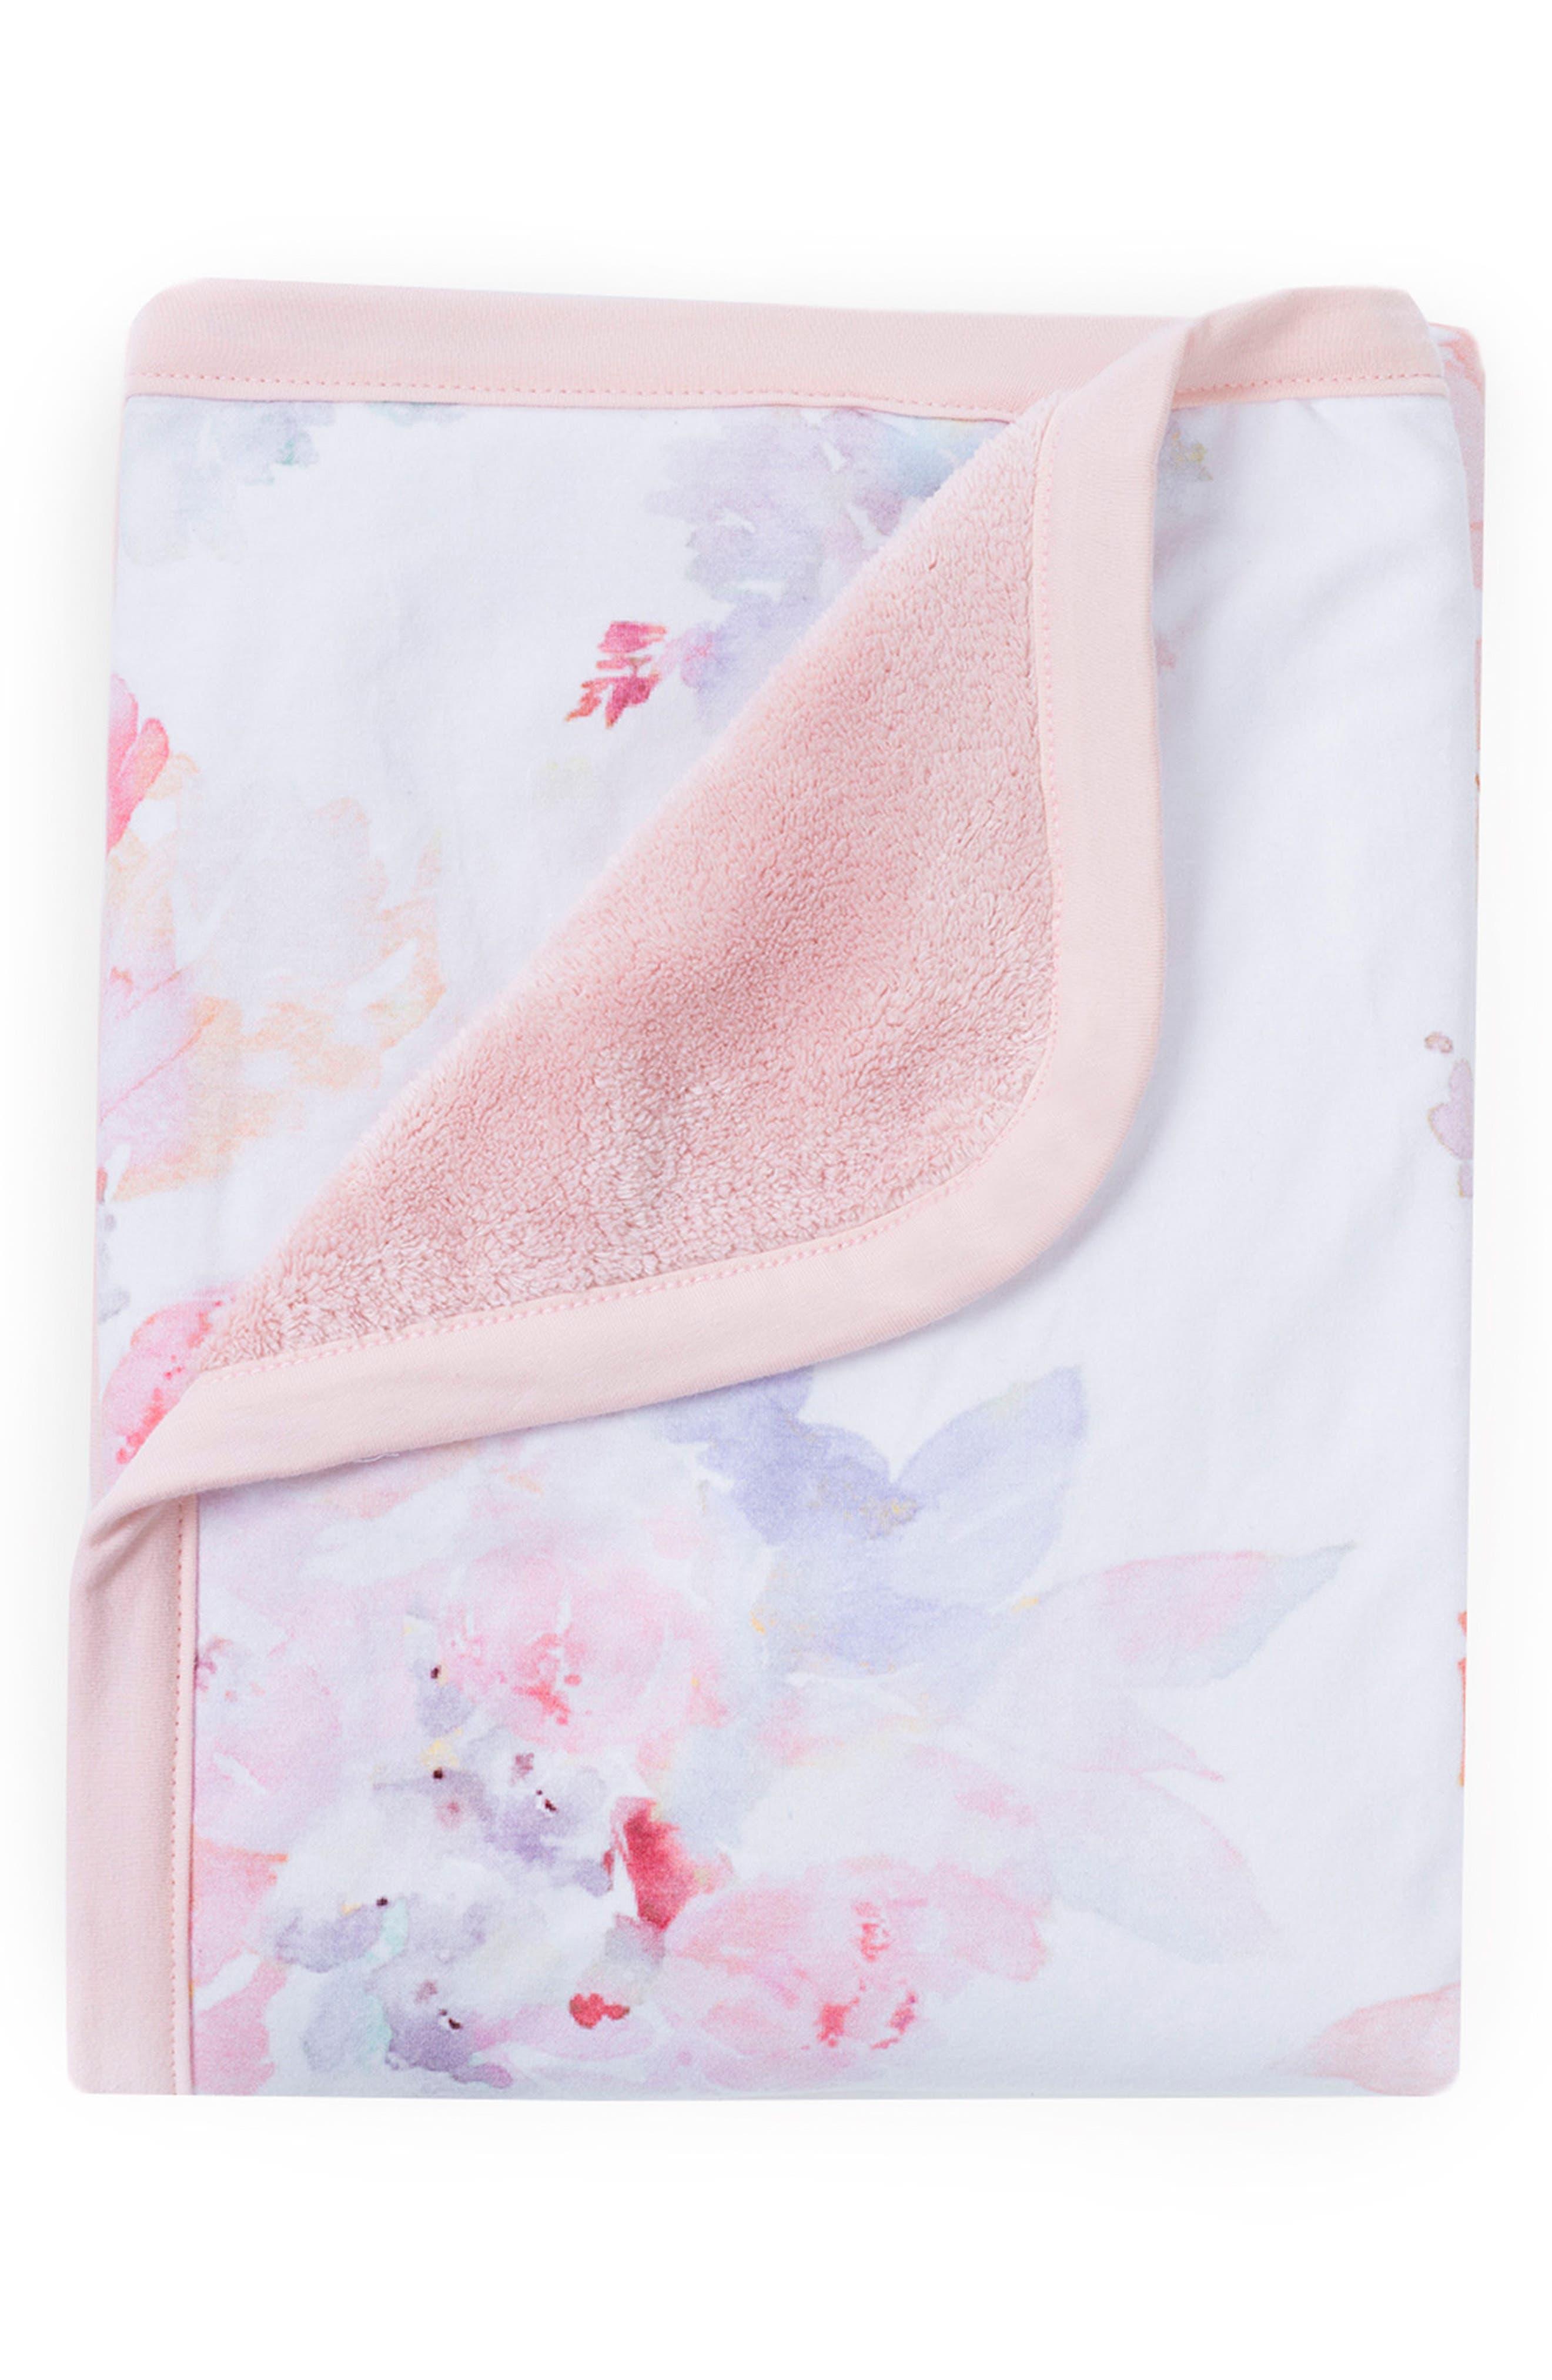 Prim Cuddle Blanket,                             Main thumbnail 1, color,                             Prim